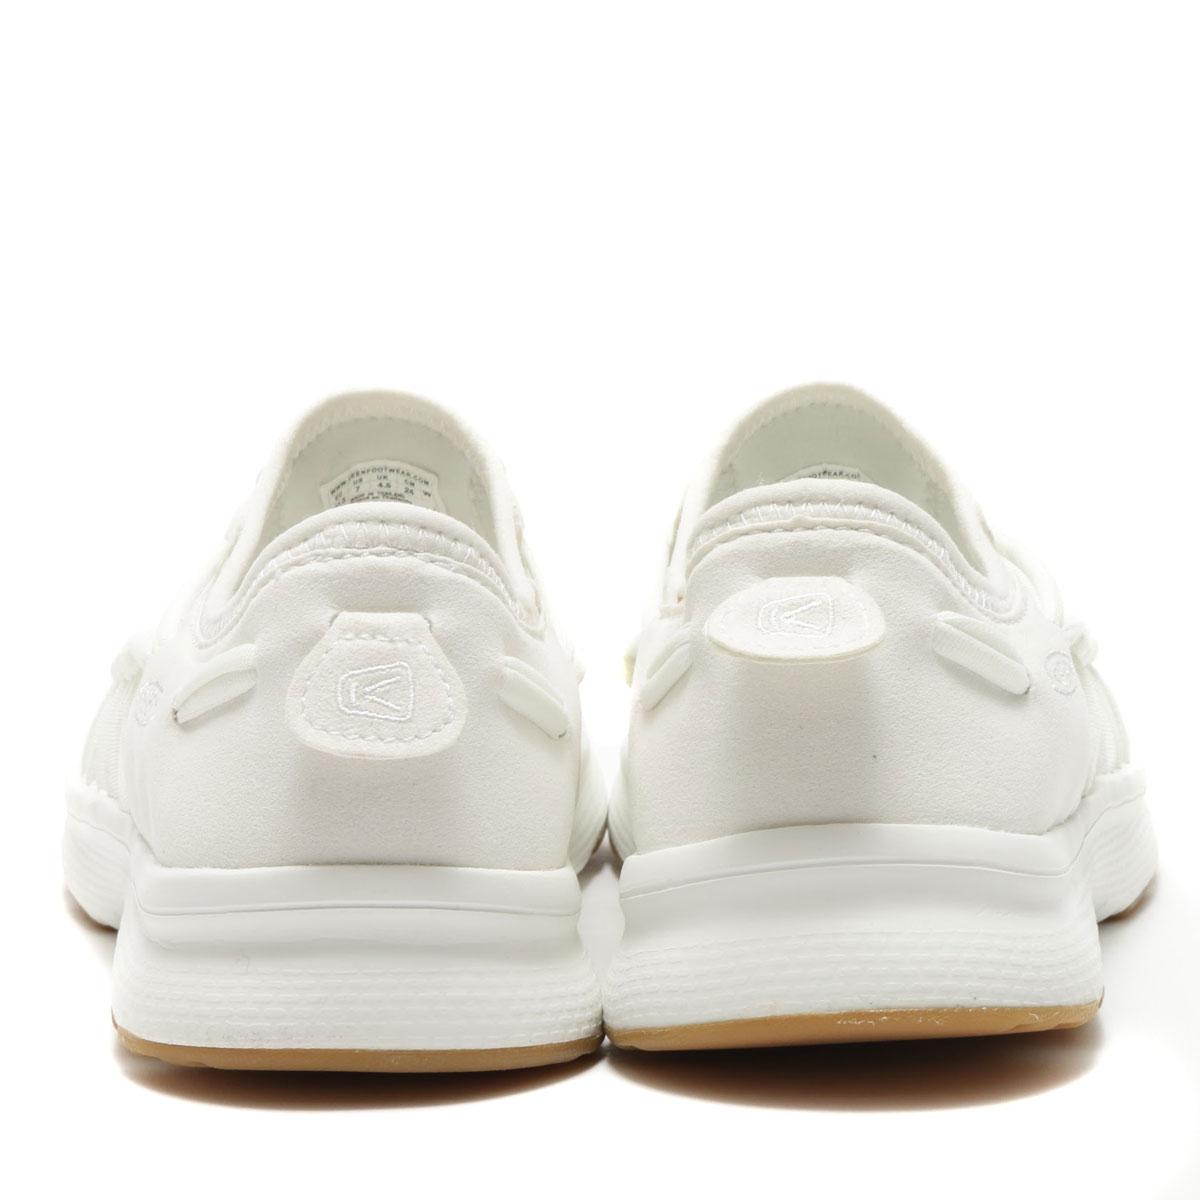 KEEN UNEEK O2(WHITE/HARVEST GOLD)(キーンユニーク オーツー)【レディース】【サンダル】【19SS-I】